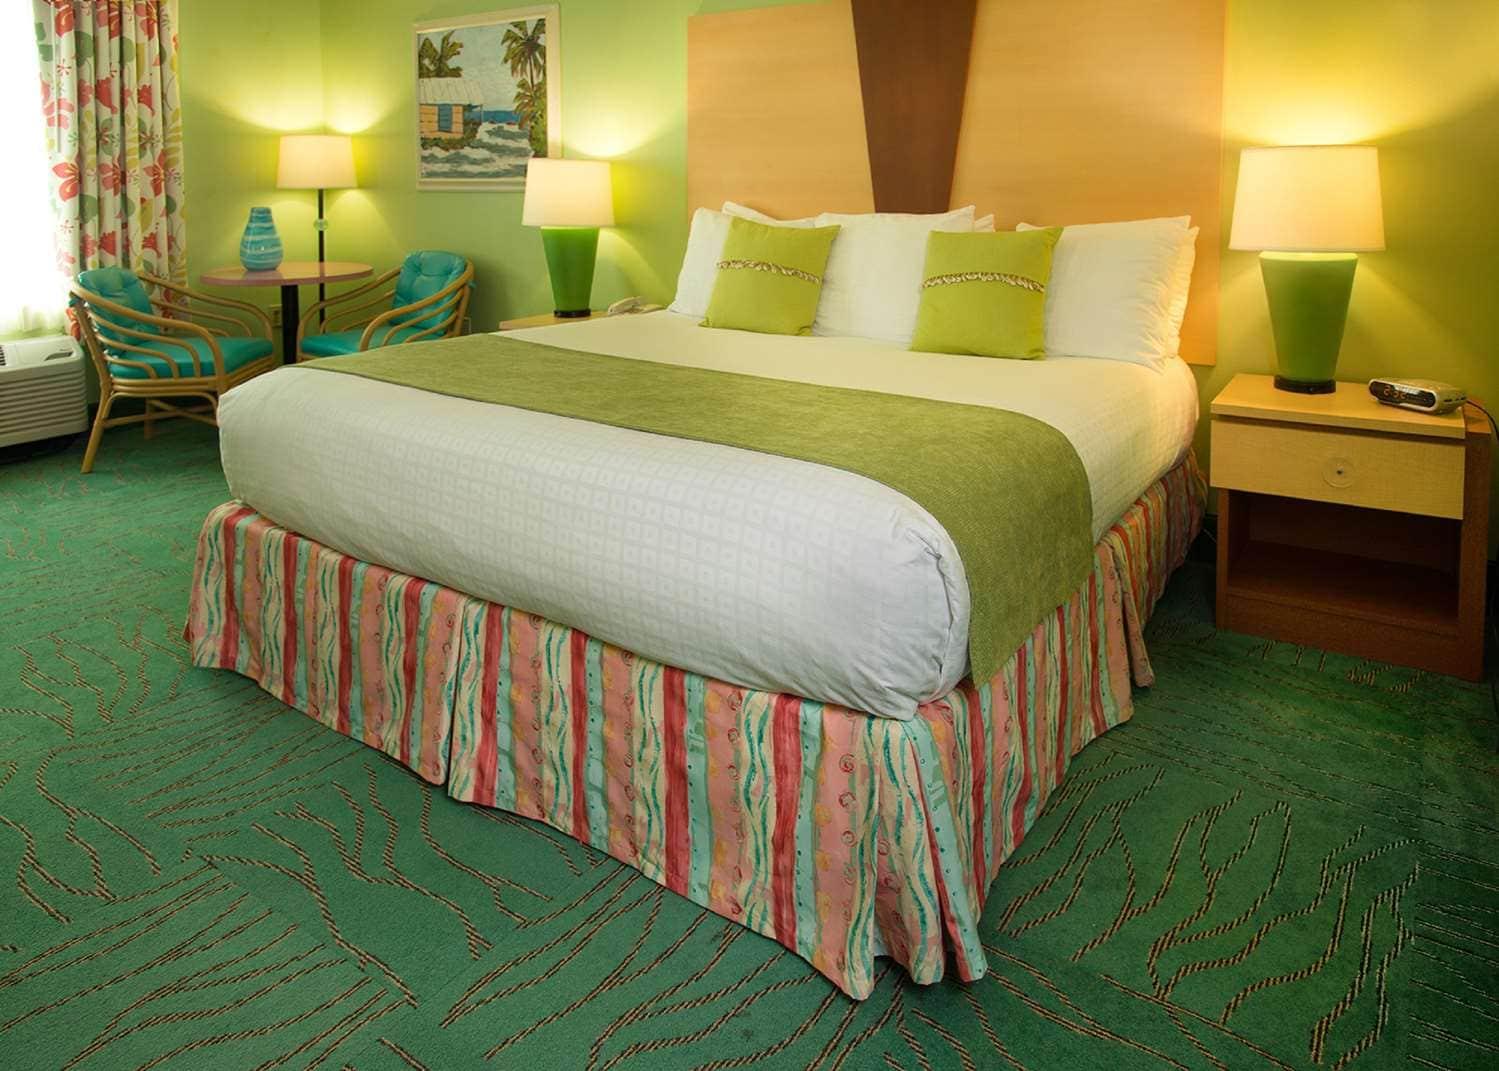 Hotel In Fort Walton Beach, FL - Best Western Beachfront